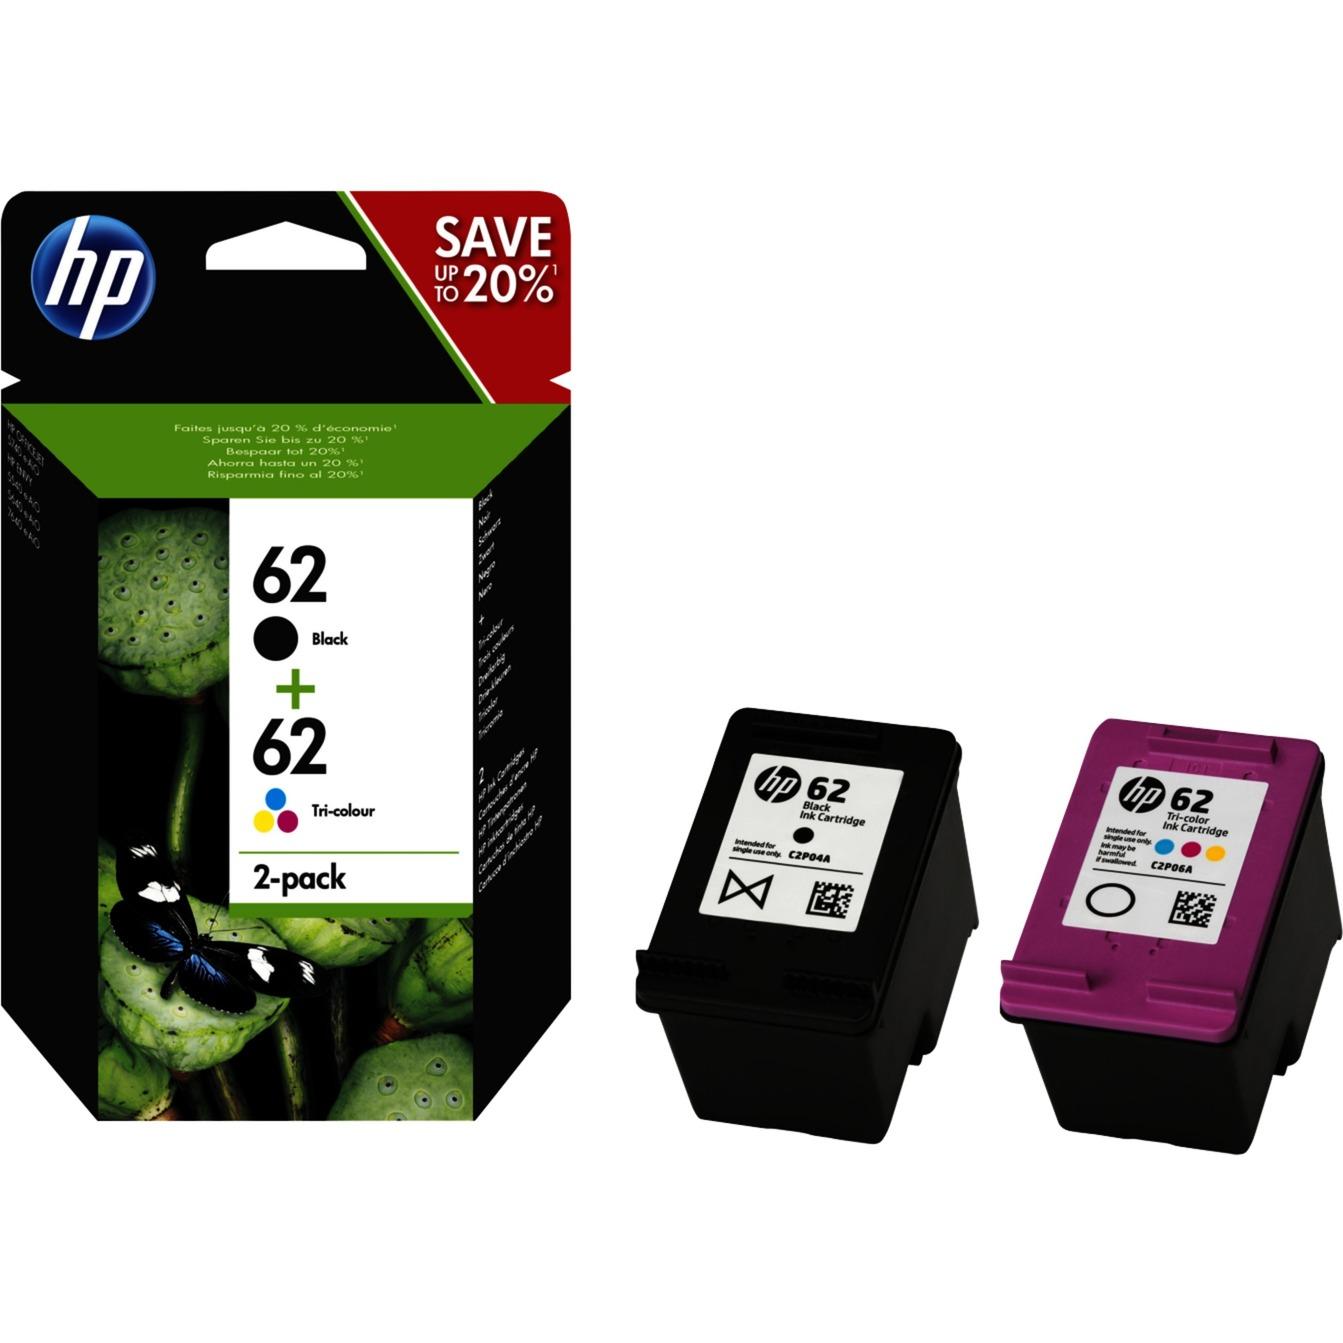 hp envy 5540 stampante ink prezzi migliori offerte. Black Bedroom Furniture Sets. Home Design Ideas